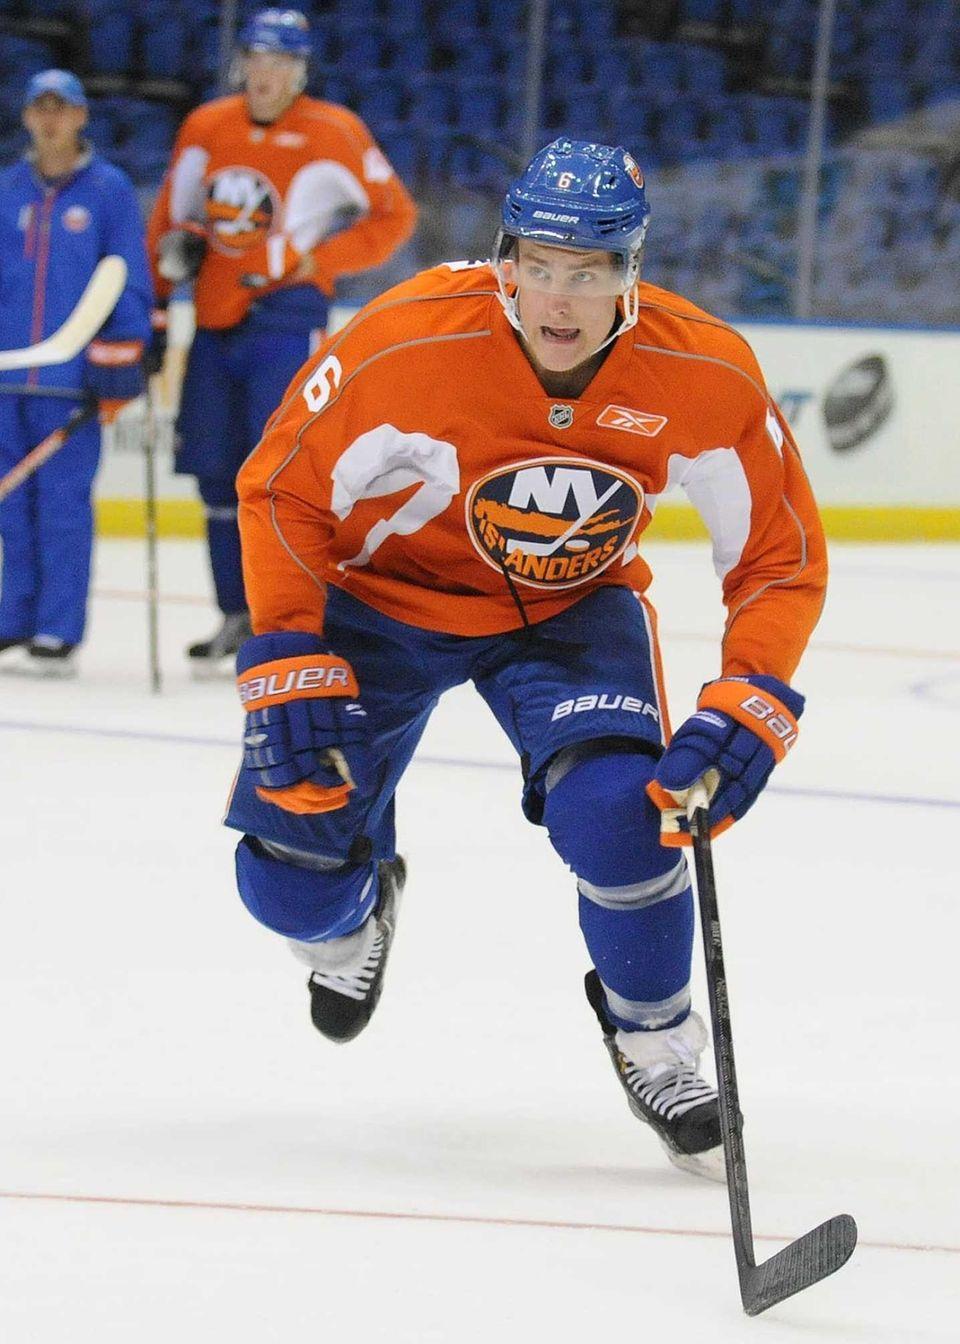 Islanders prospect Ryan Pulock skates during minicamp at